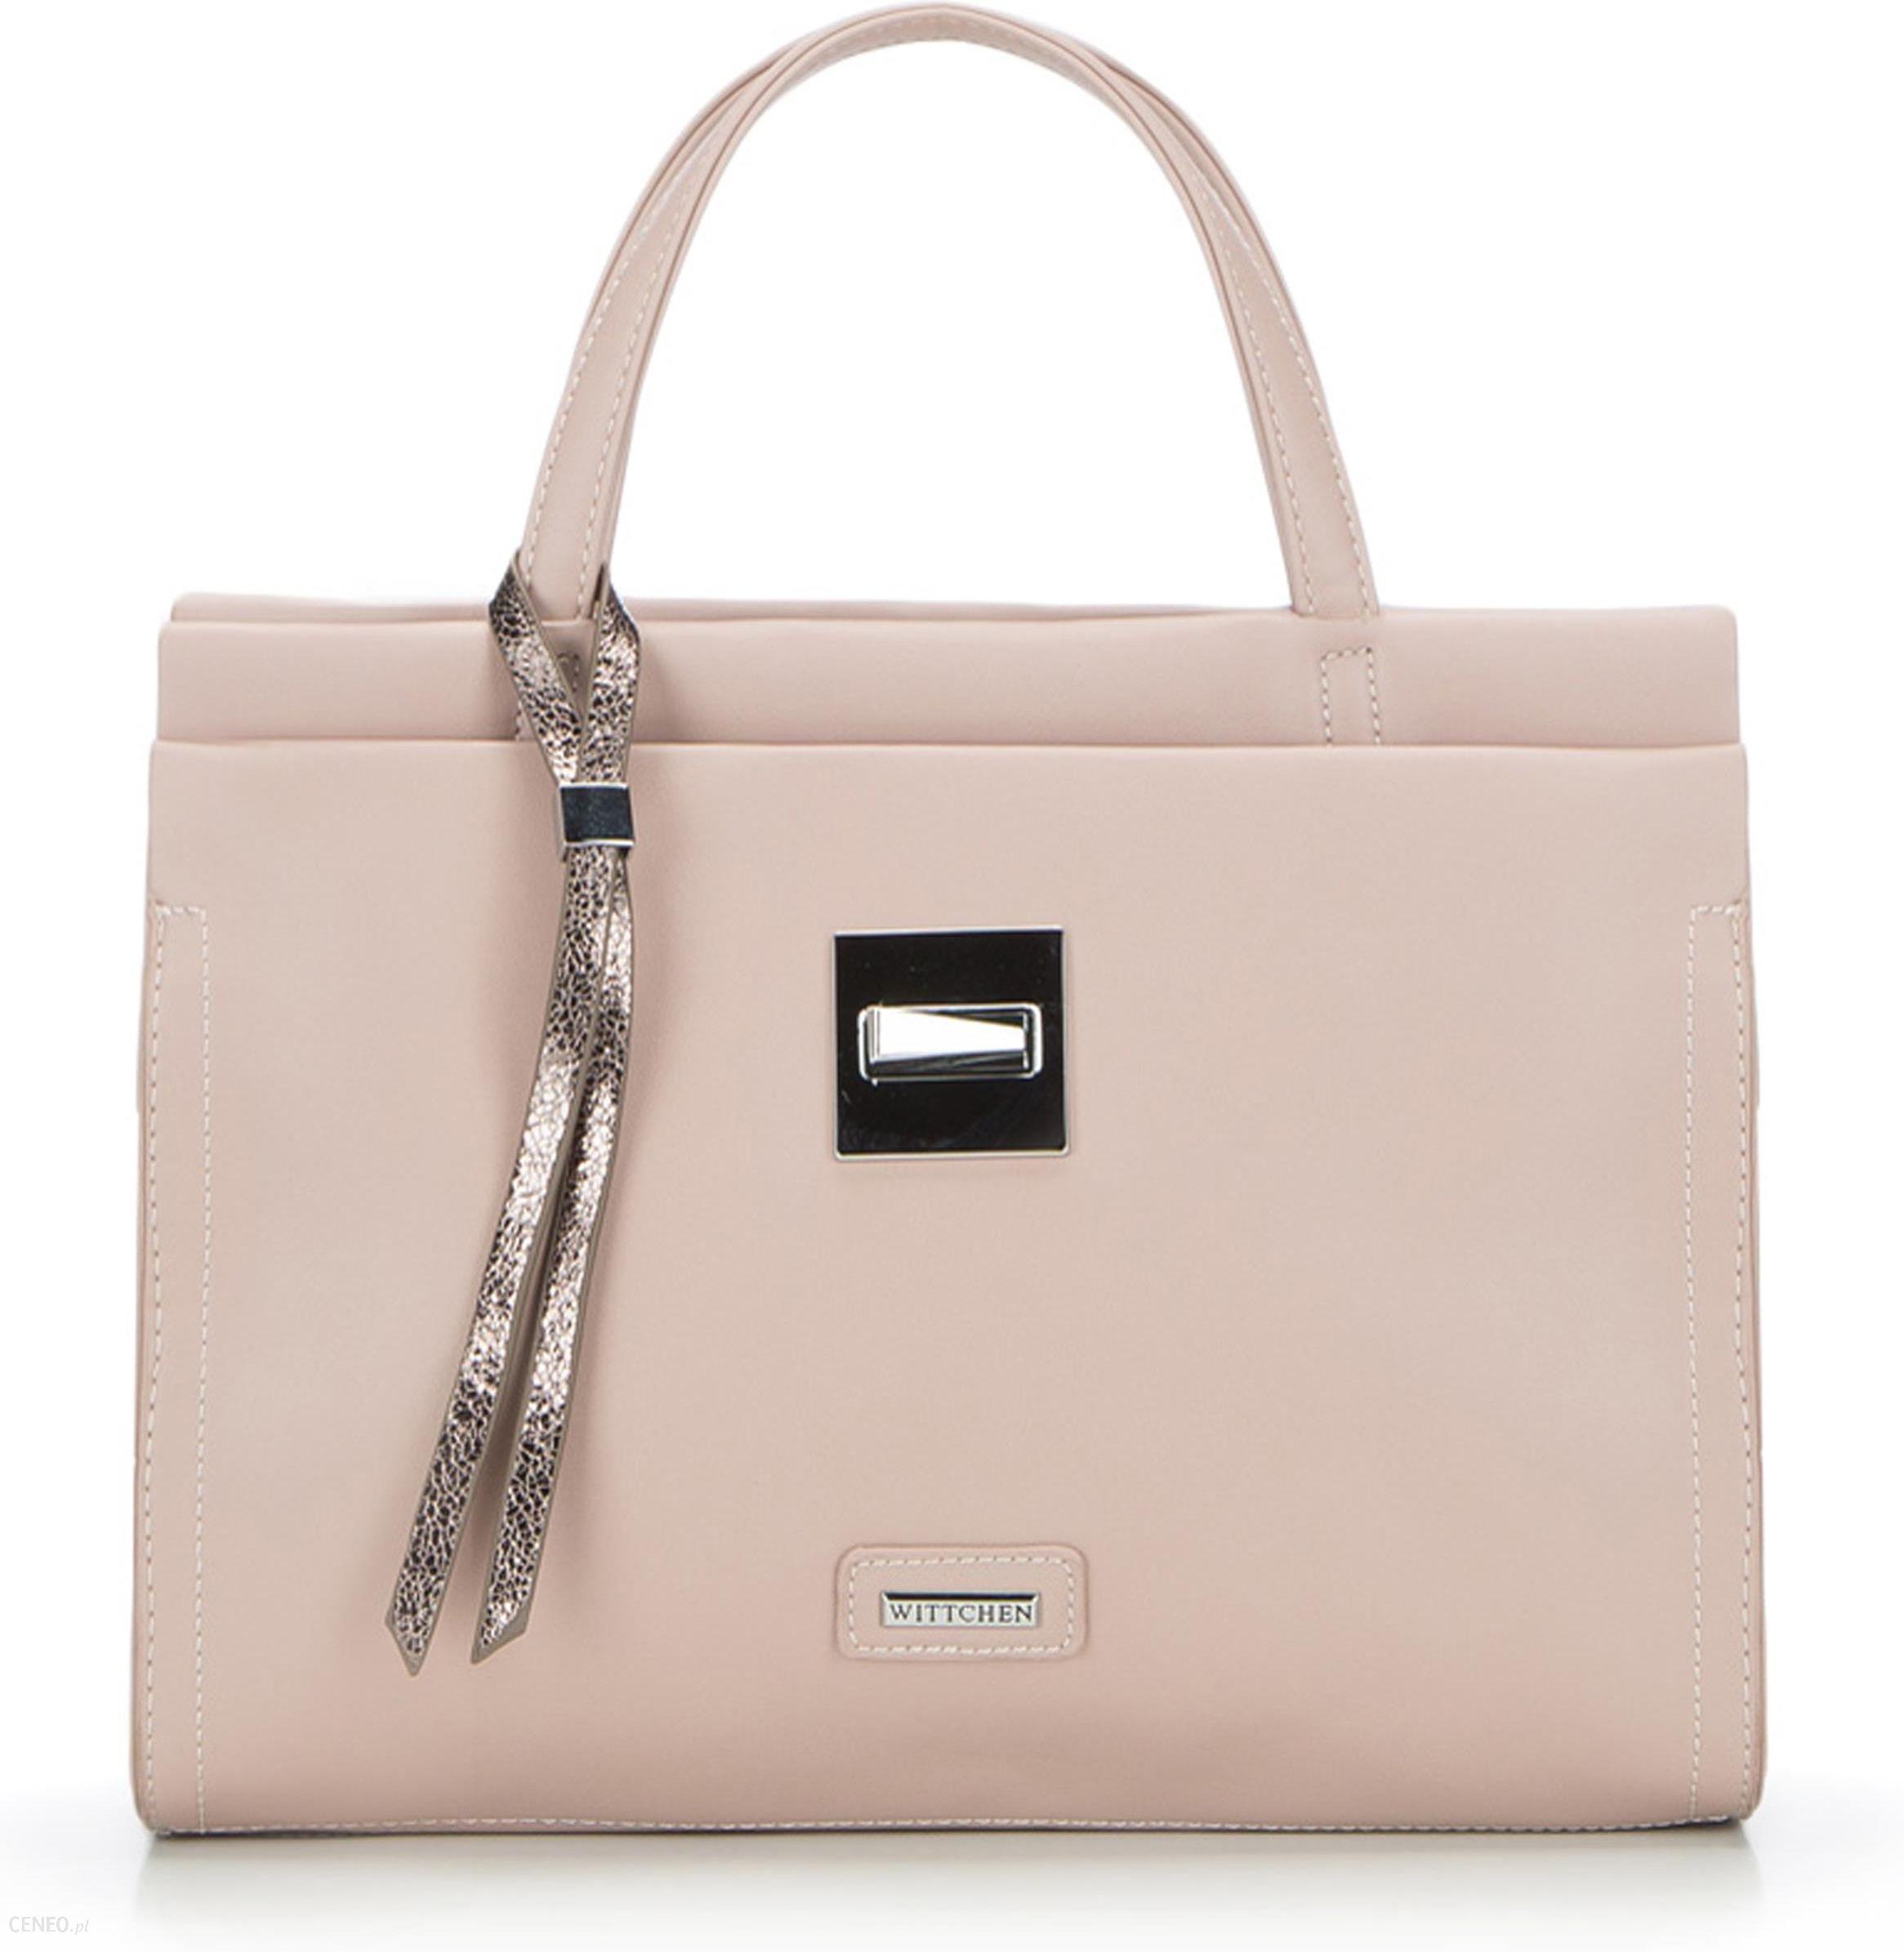 21d81834758b6 Torebka Wittchen Young Handbag 86-4Y-208-P pudrowy róż - Ceny i ...